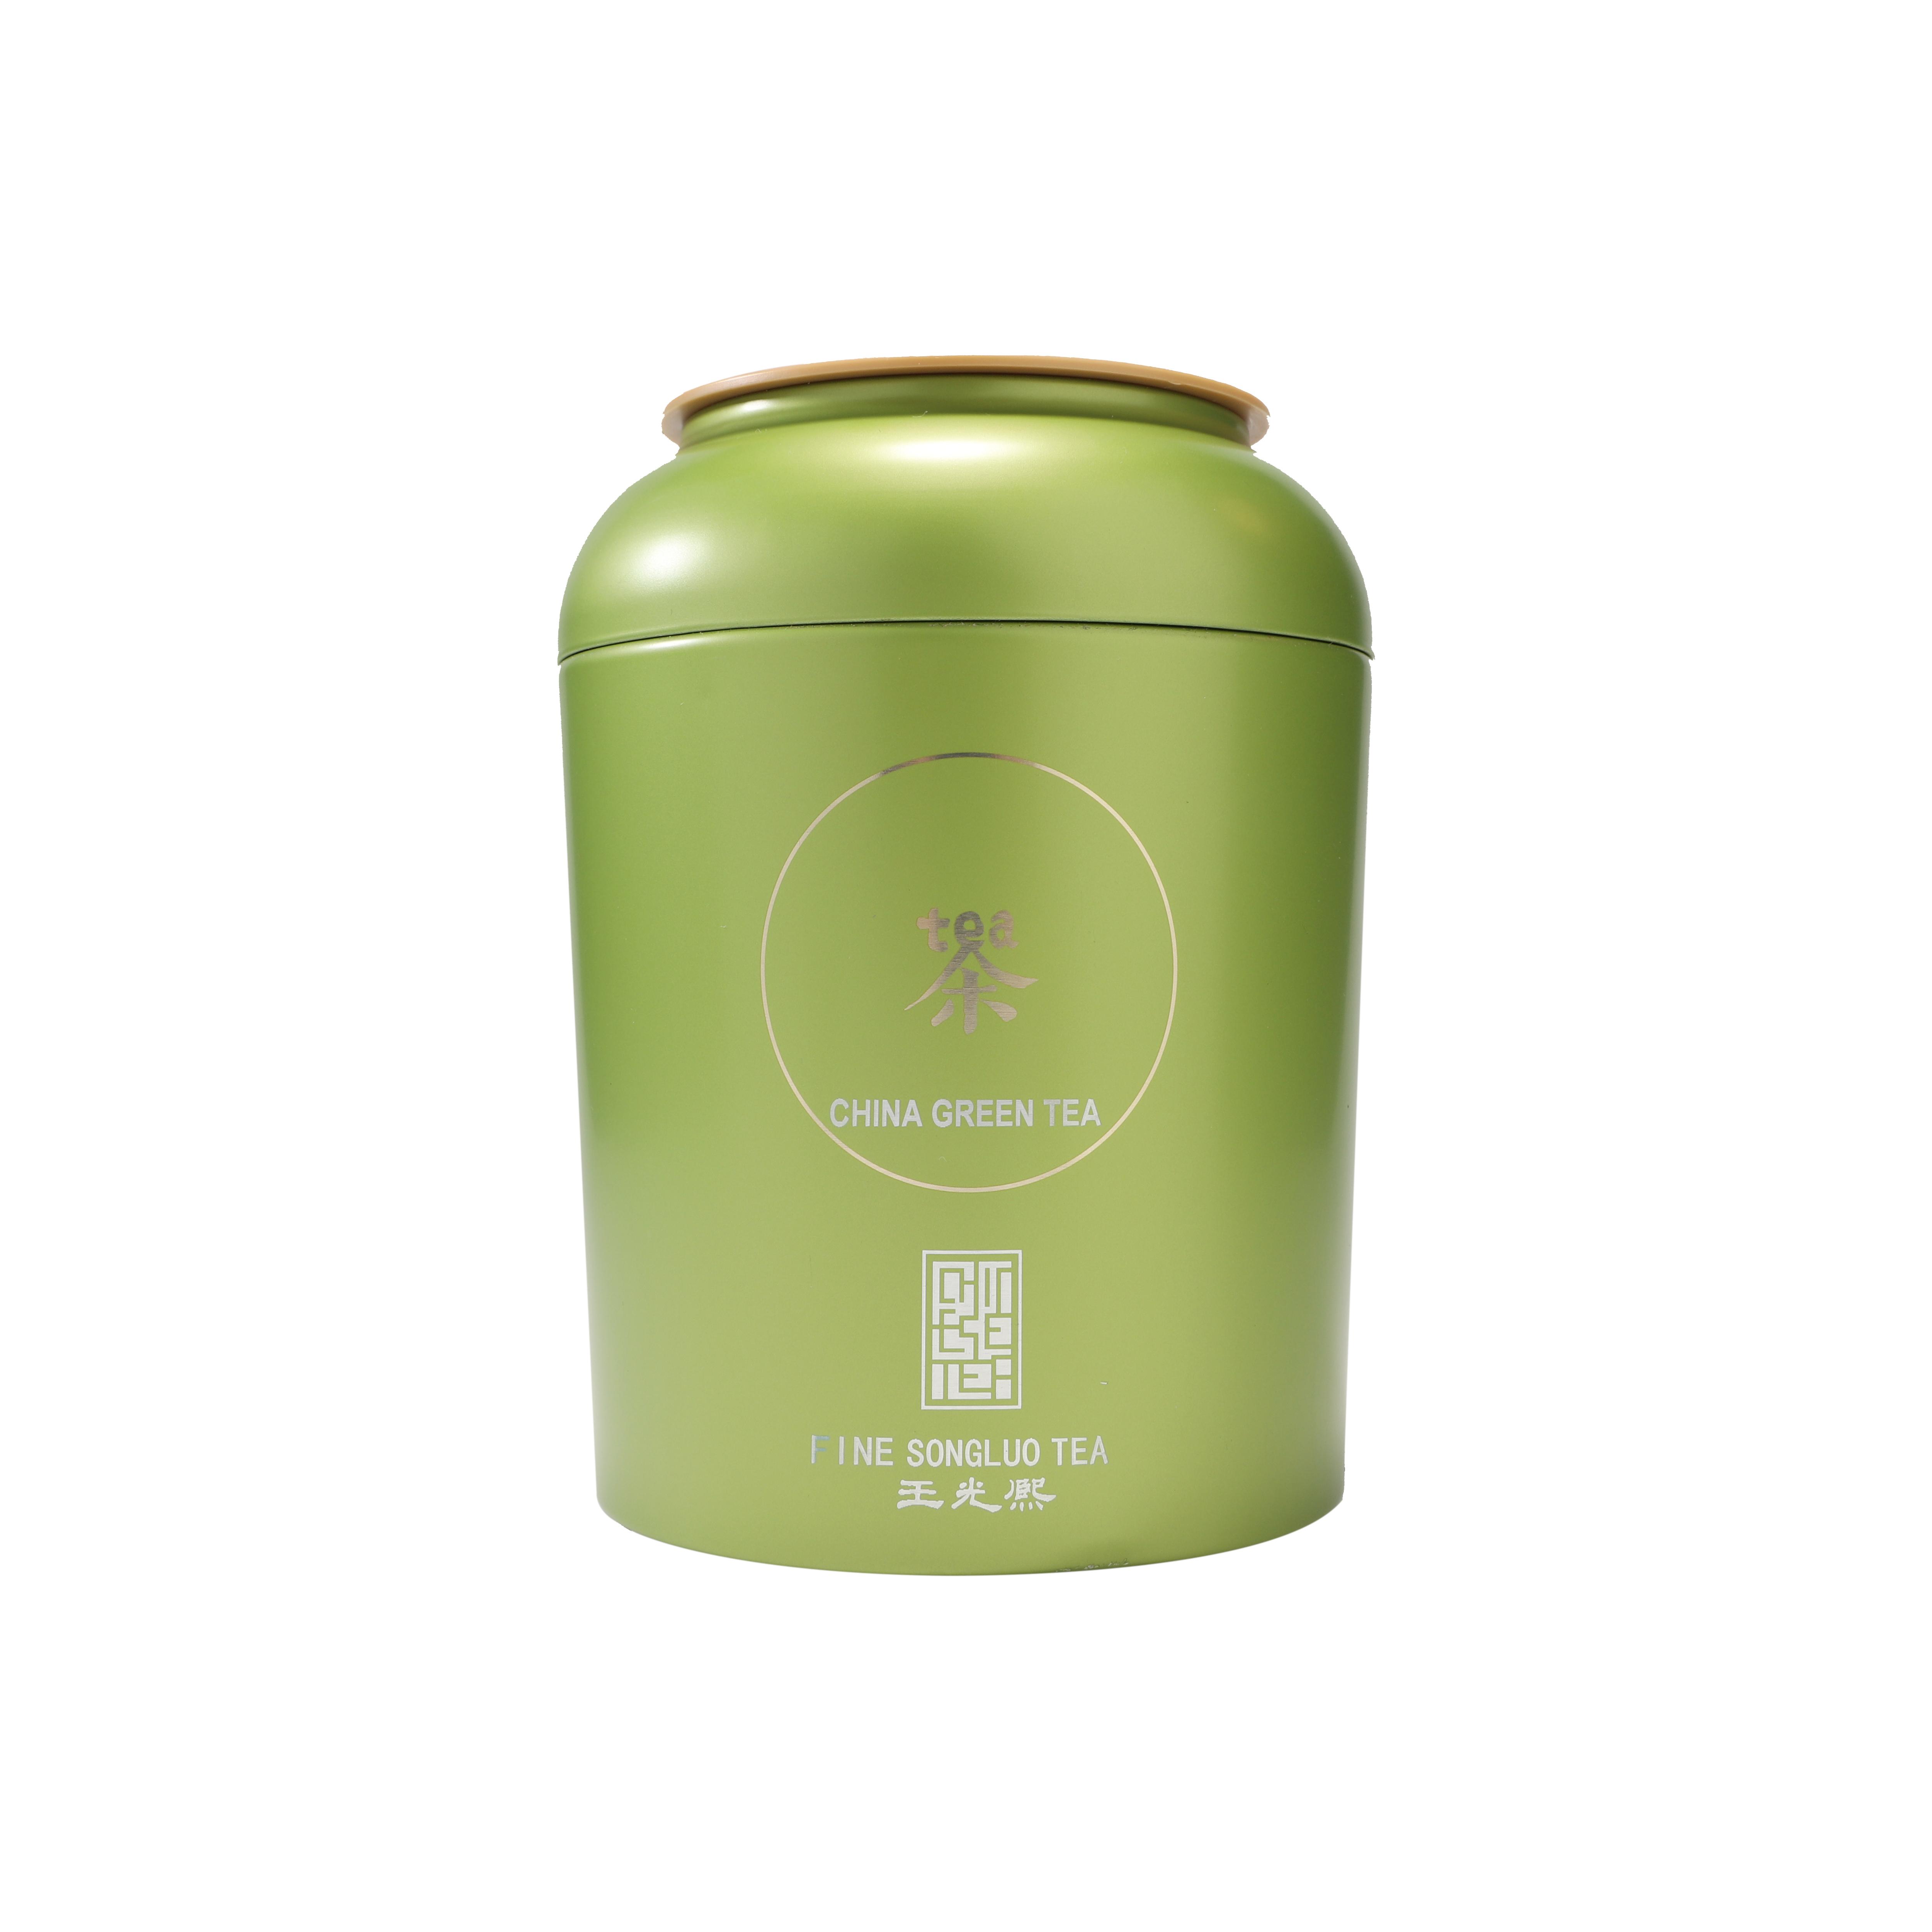 Natural Skin Beauty blooming Tea organic Jasmine green Tea - 4uTea | 4uTea.com